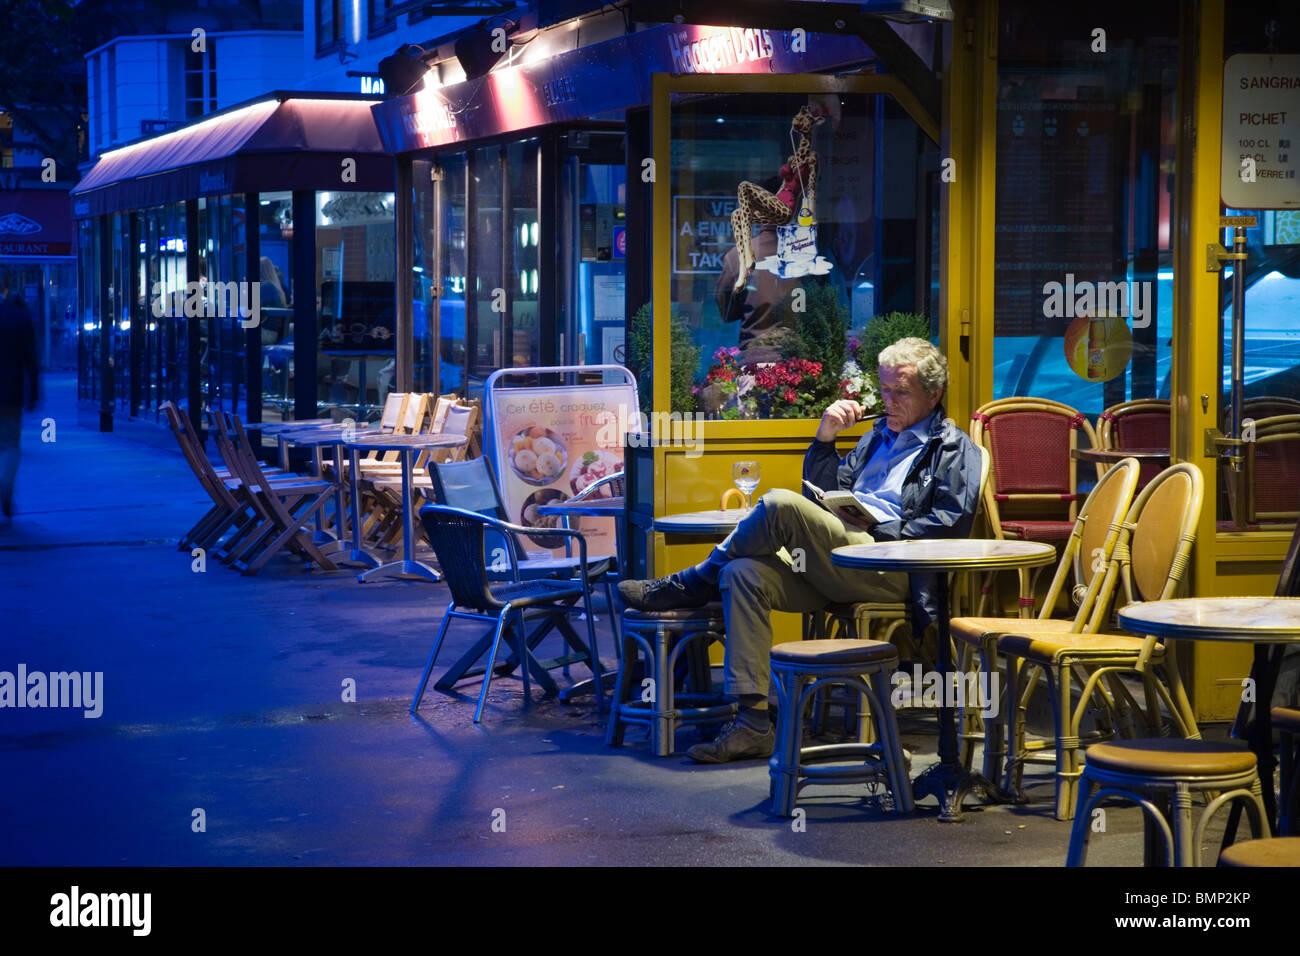 Evening scene in the Rive Gauche, Boulevard St Germain, Paris - Stock Image